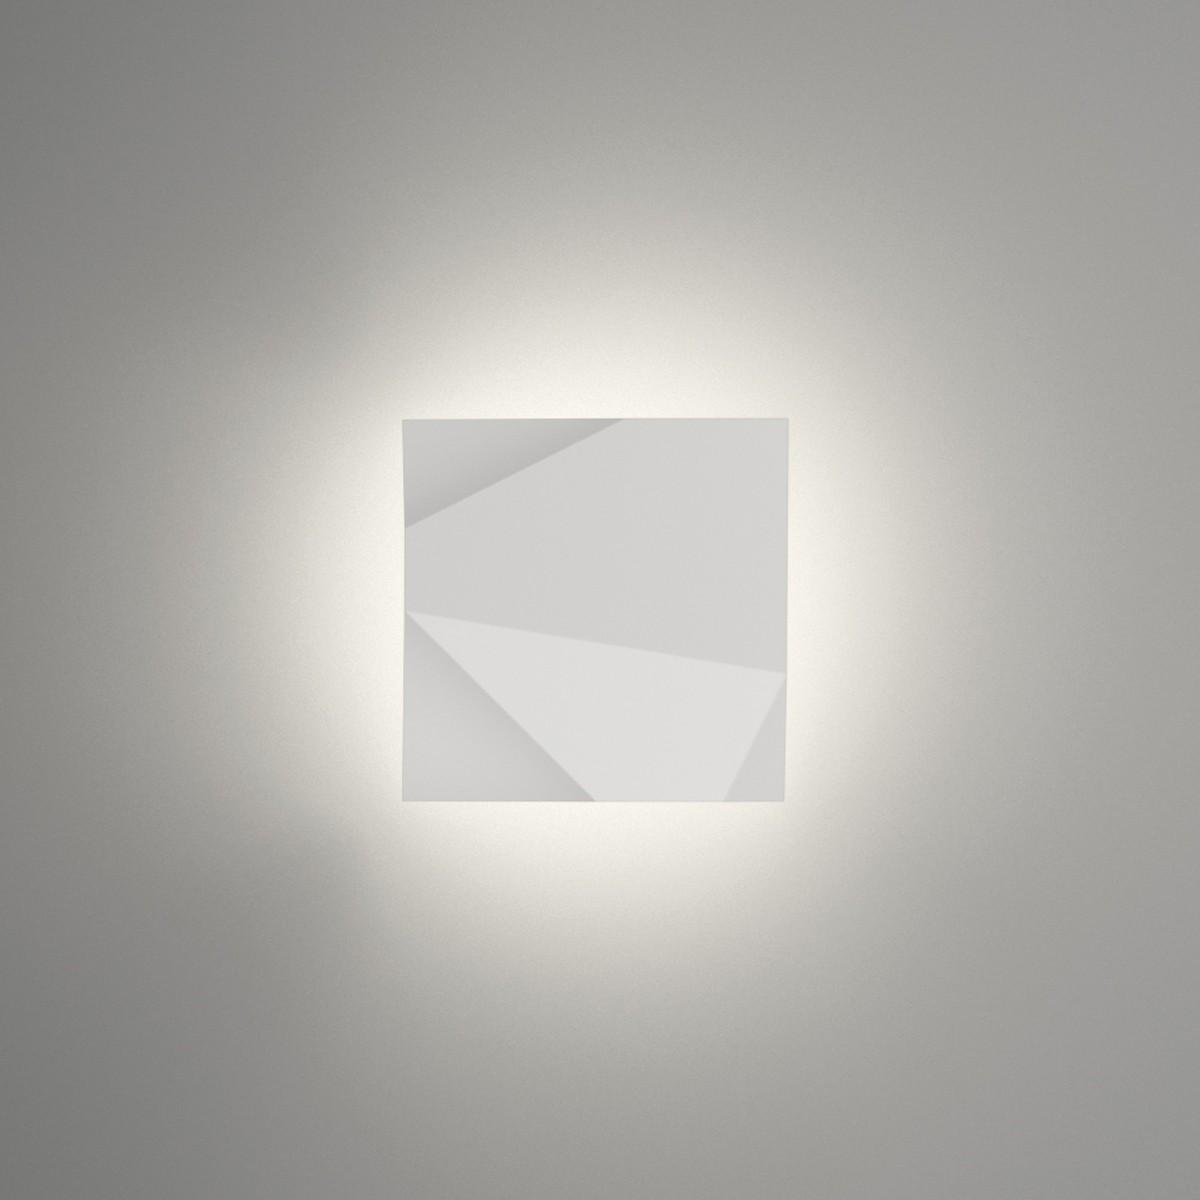 Vibia Origami 4500 Wandleuchte, weiß matt